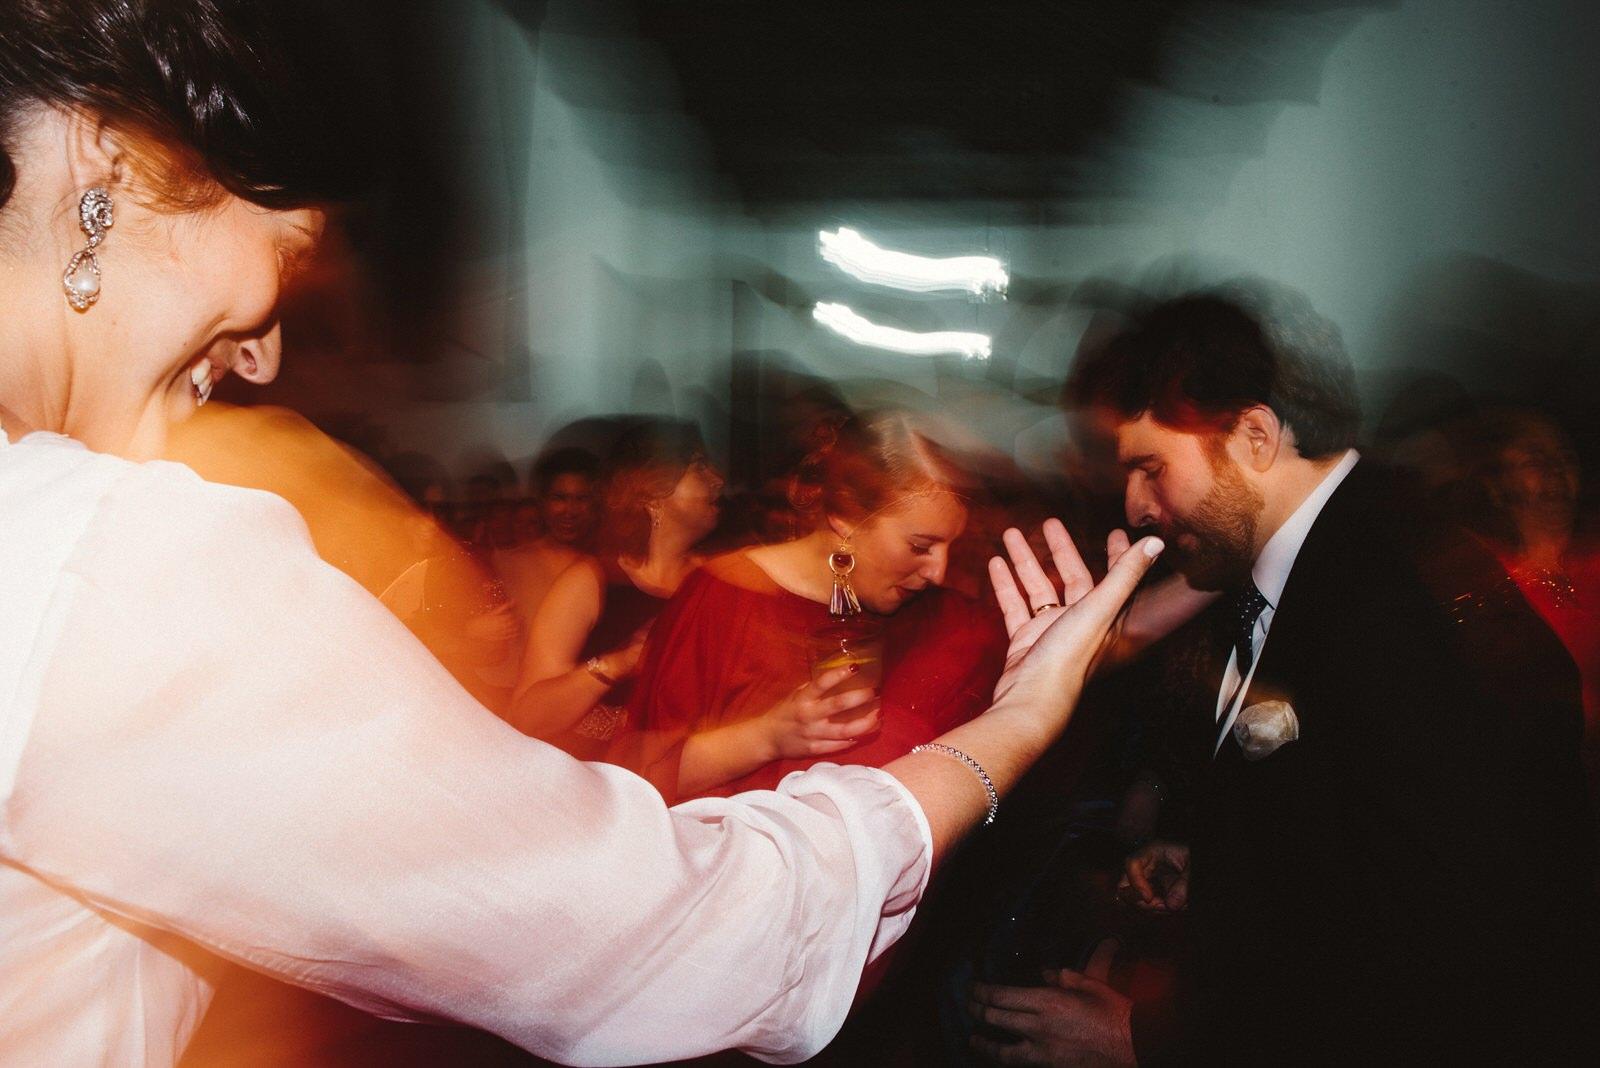 fotografo de bodas sevilla - fotografo boda - fotografía sevilla - Andrés AmarilloAAA_4001- fine.JPG